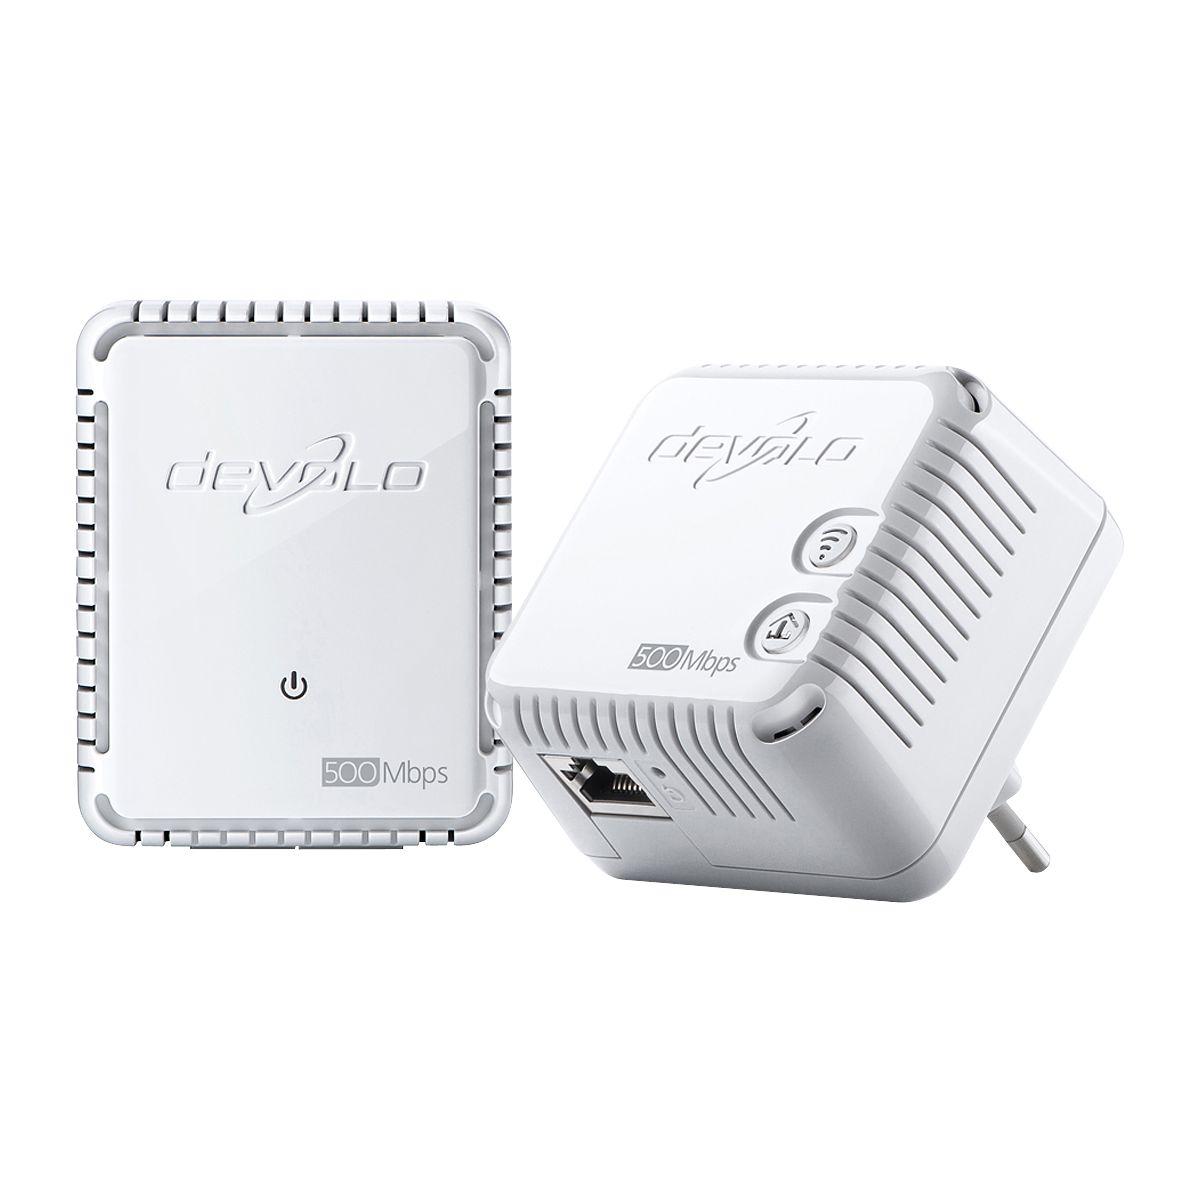 Cpl duo devolo dlan 500 wifi starter kit - livraison offerte : code liv